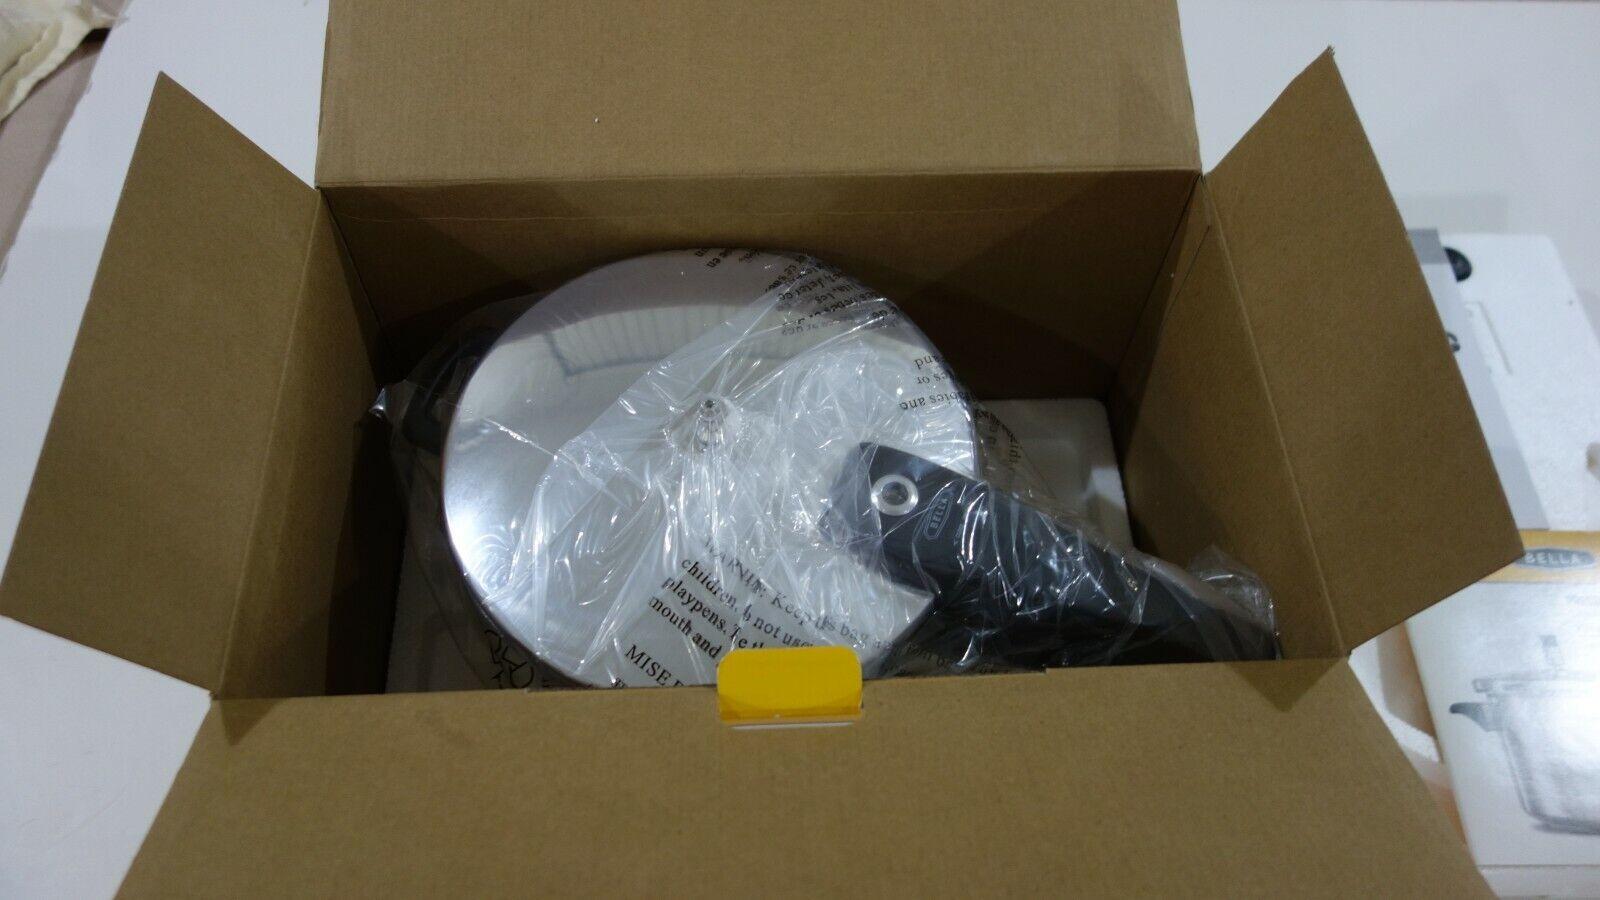 BELLA Aluminum PRESSURE COOKER 5 QUART CAPACITY Stovetop NEW